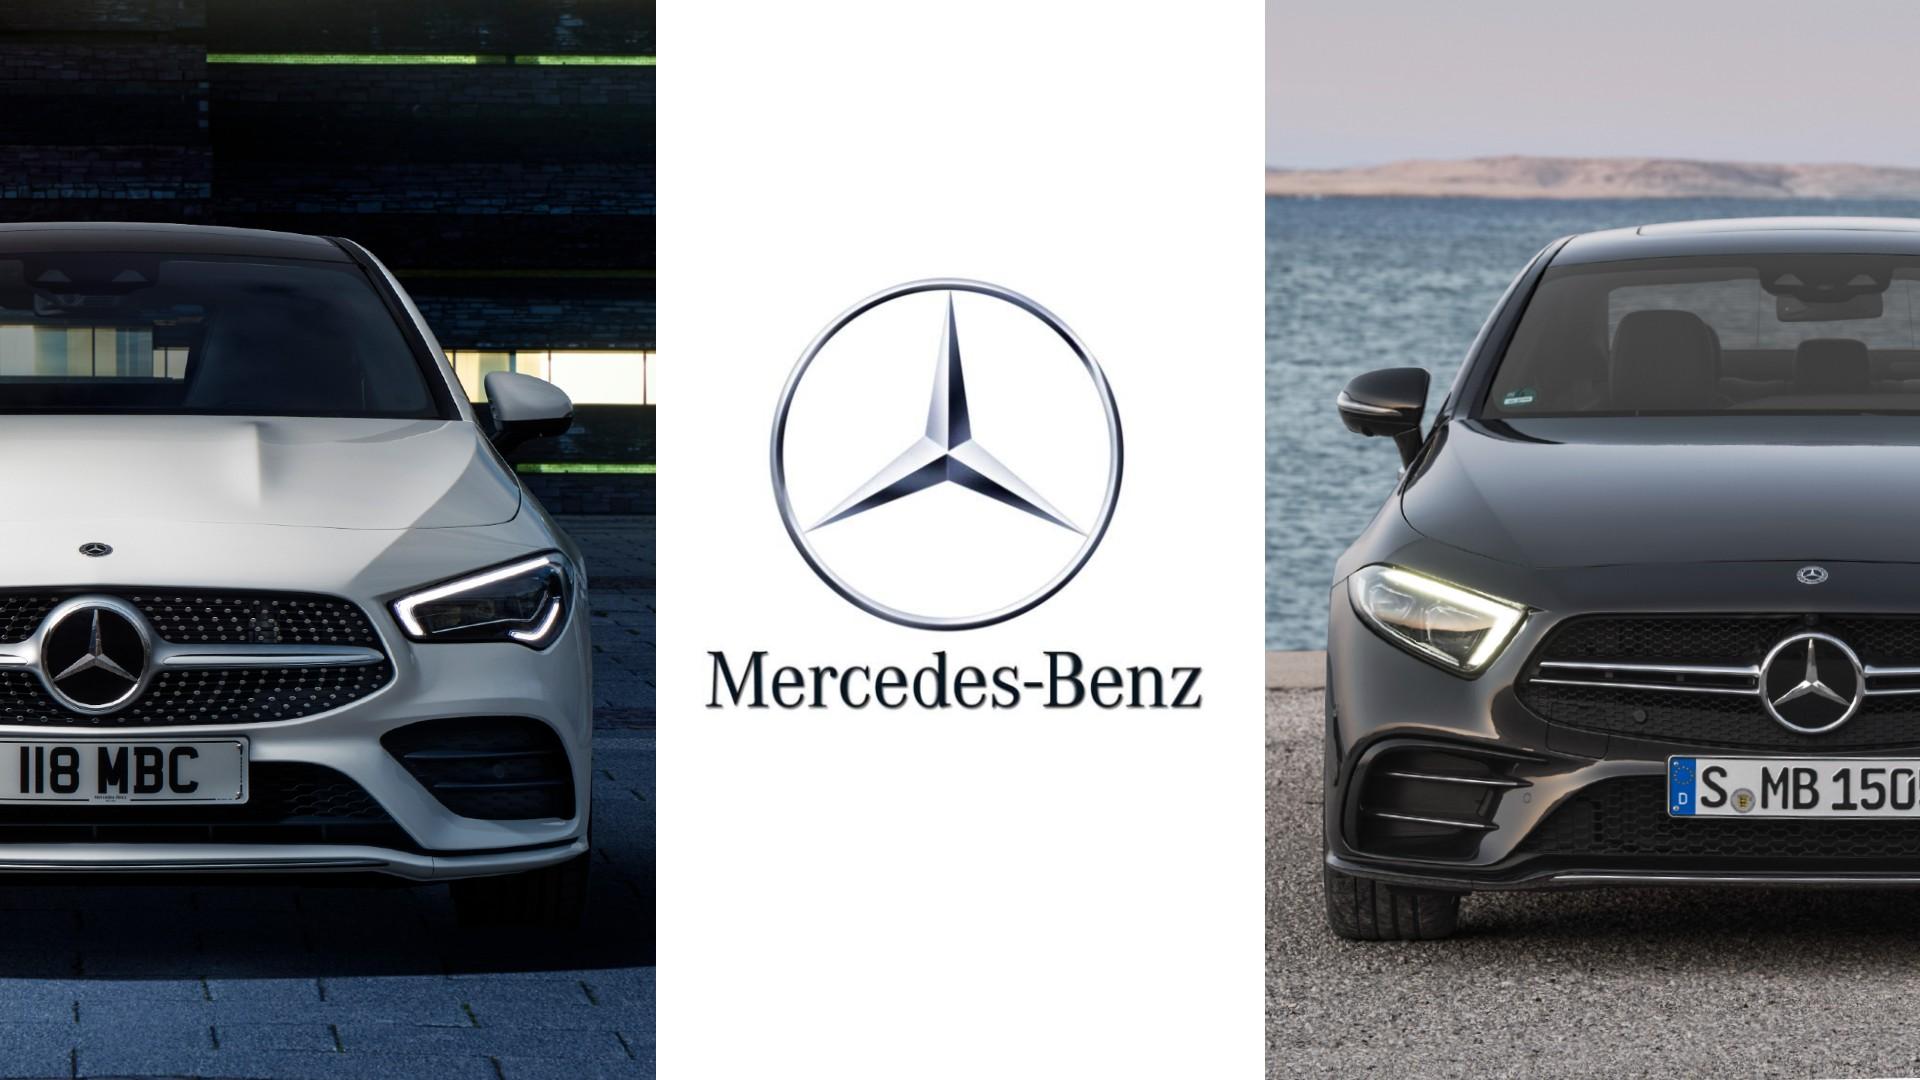 H Mercedes-Benz ετοιμάζει ένα ακόμα τετράθυρο κουπέ [pics]